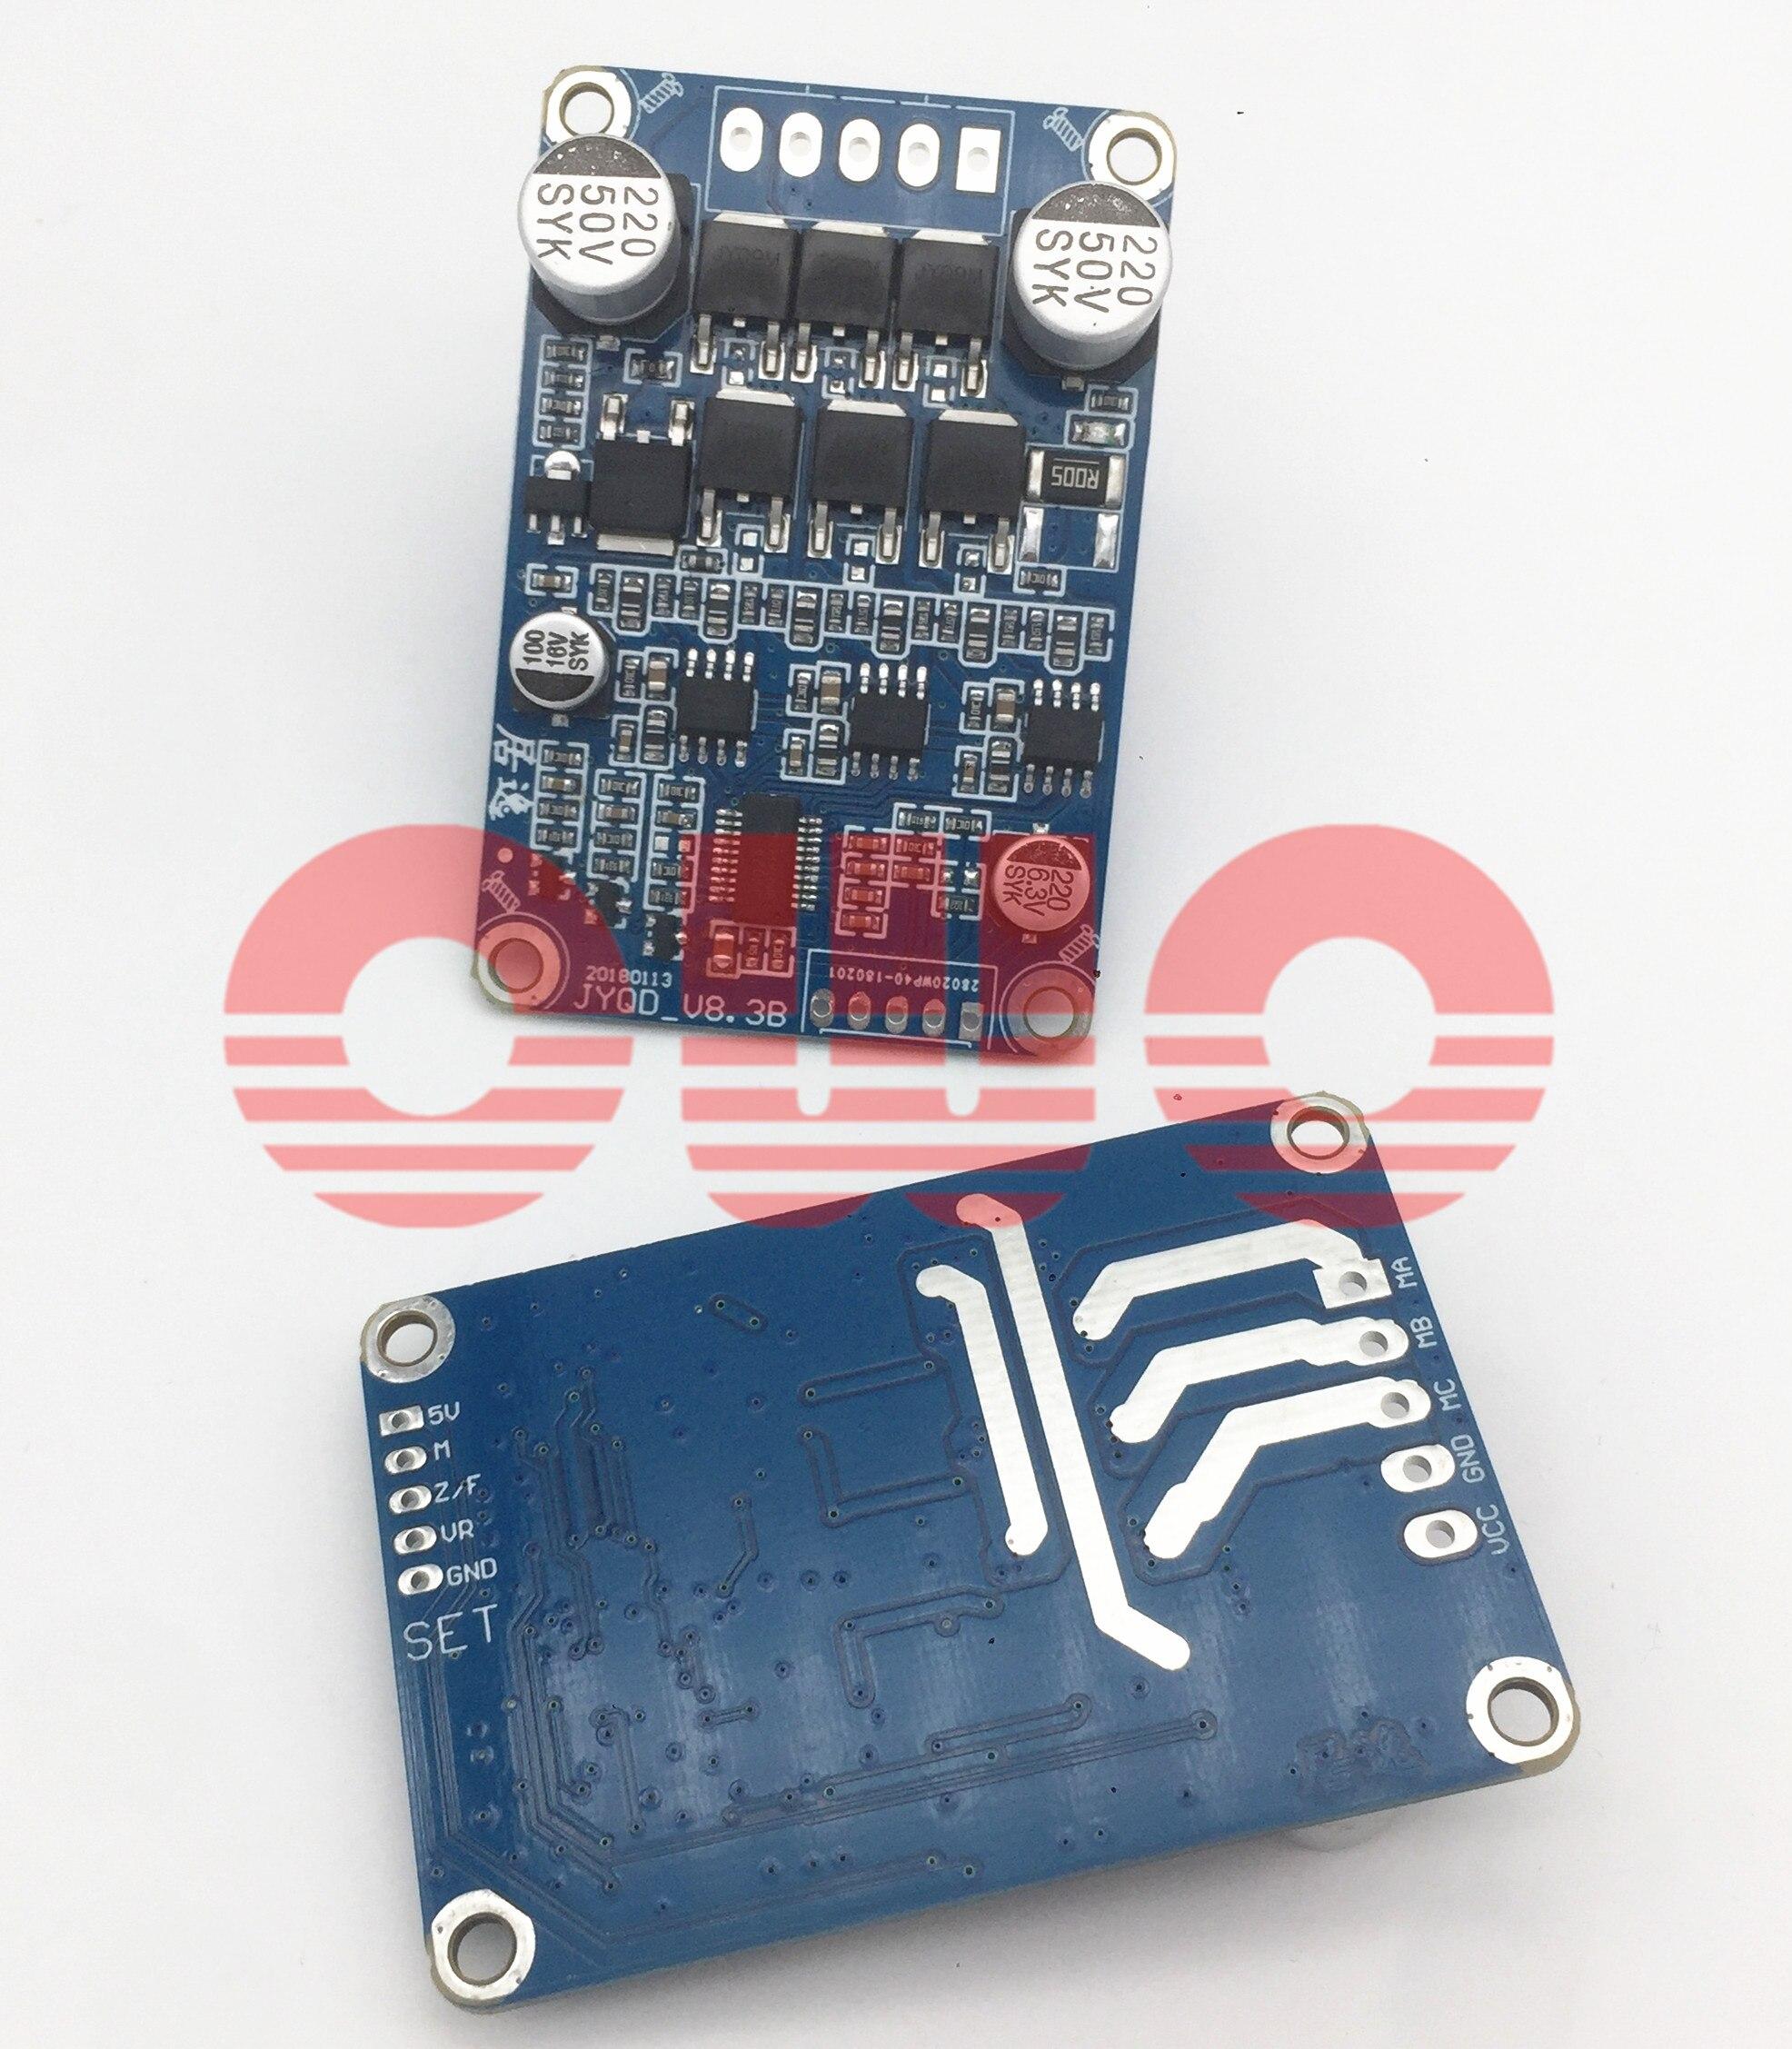 2PCS 12-36VDC Original JUYI Tech JYQD-V8.3B bldc motor driver board for sensorless brushless DC motor